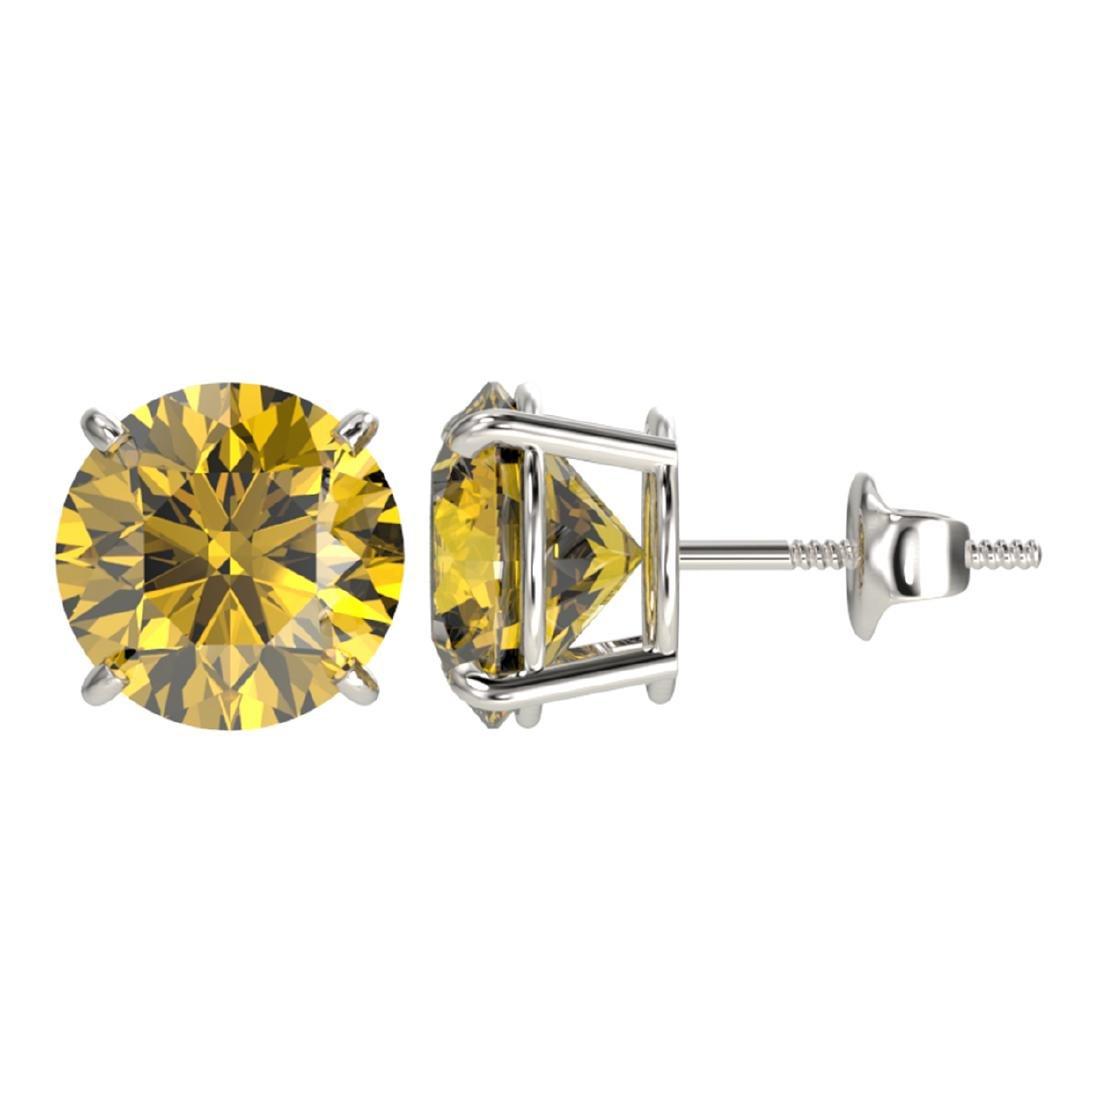 4 ctw Intense Yellow Diamond Stud Earrings 10K White - 2